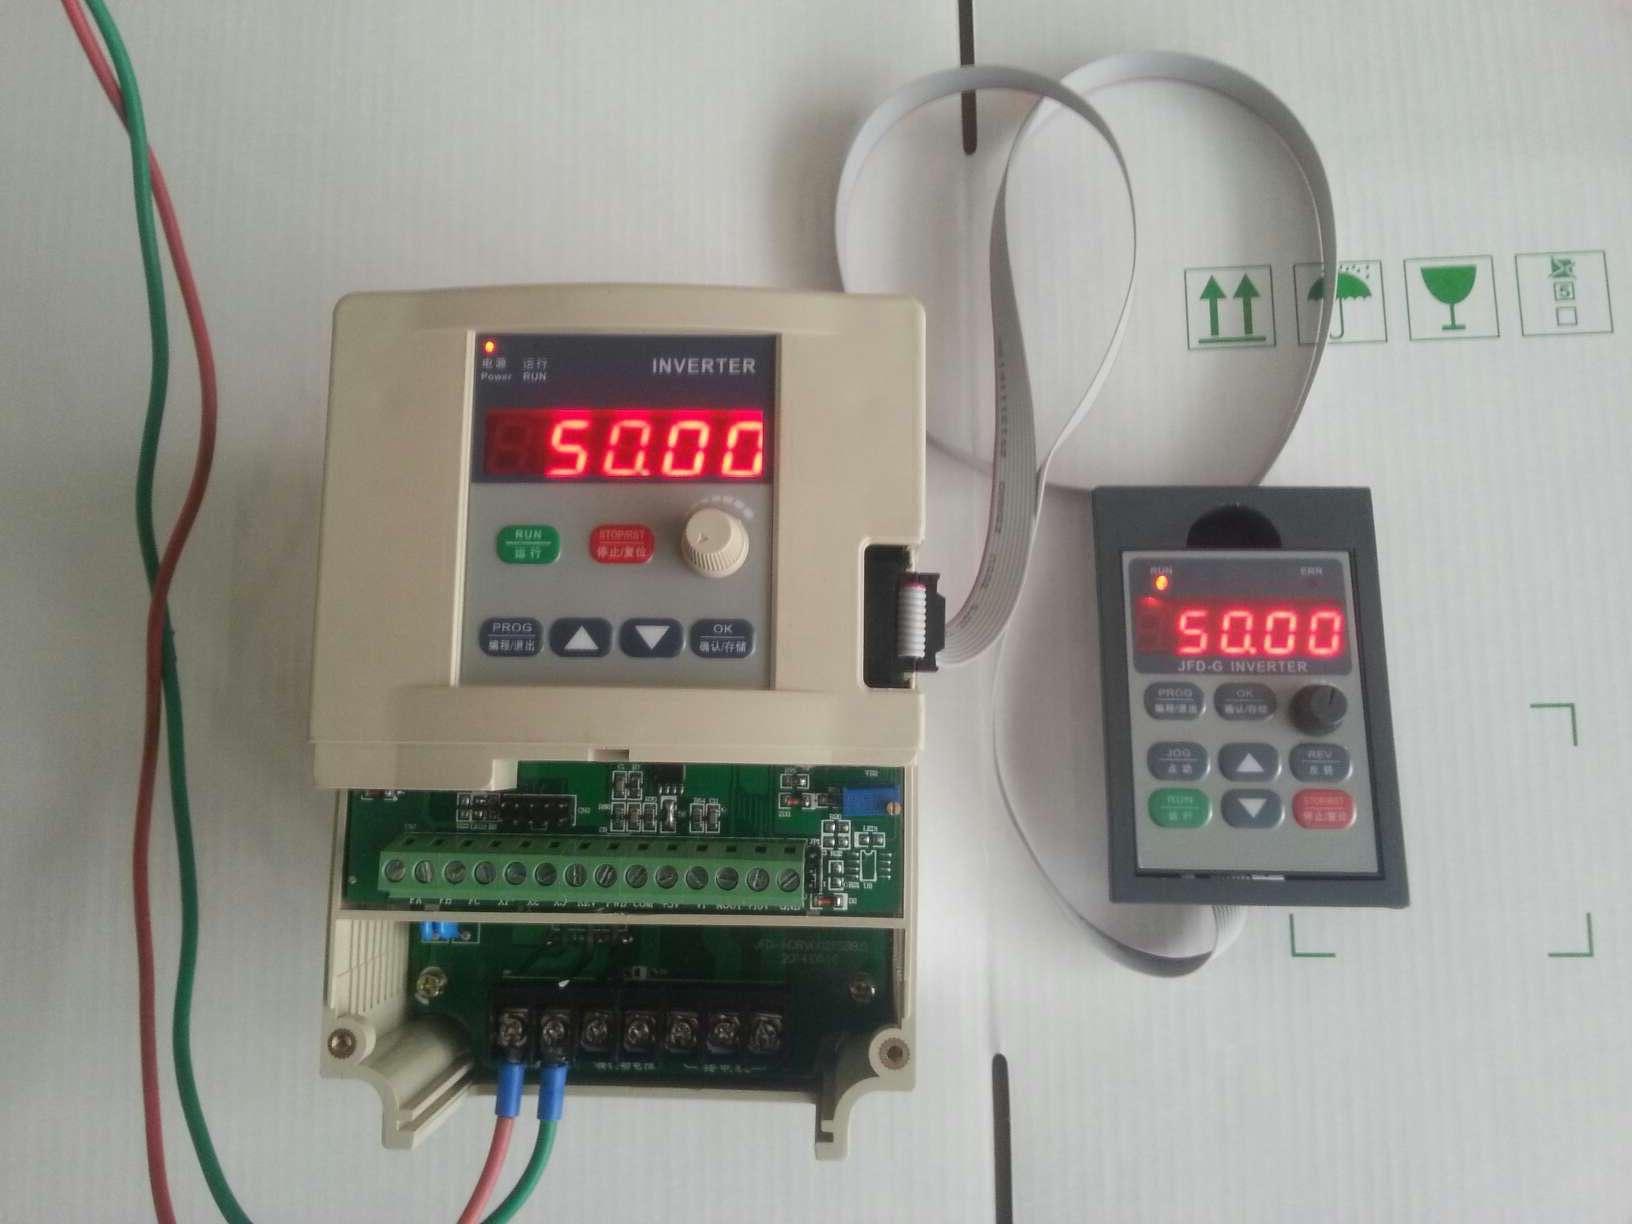 VFD Inverter Free Shipping 1500W 380v frequency converter CoolClassic Brand ventilation fan sculpture machine цена